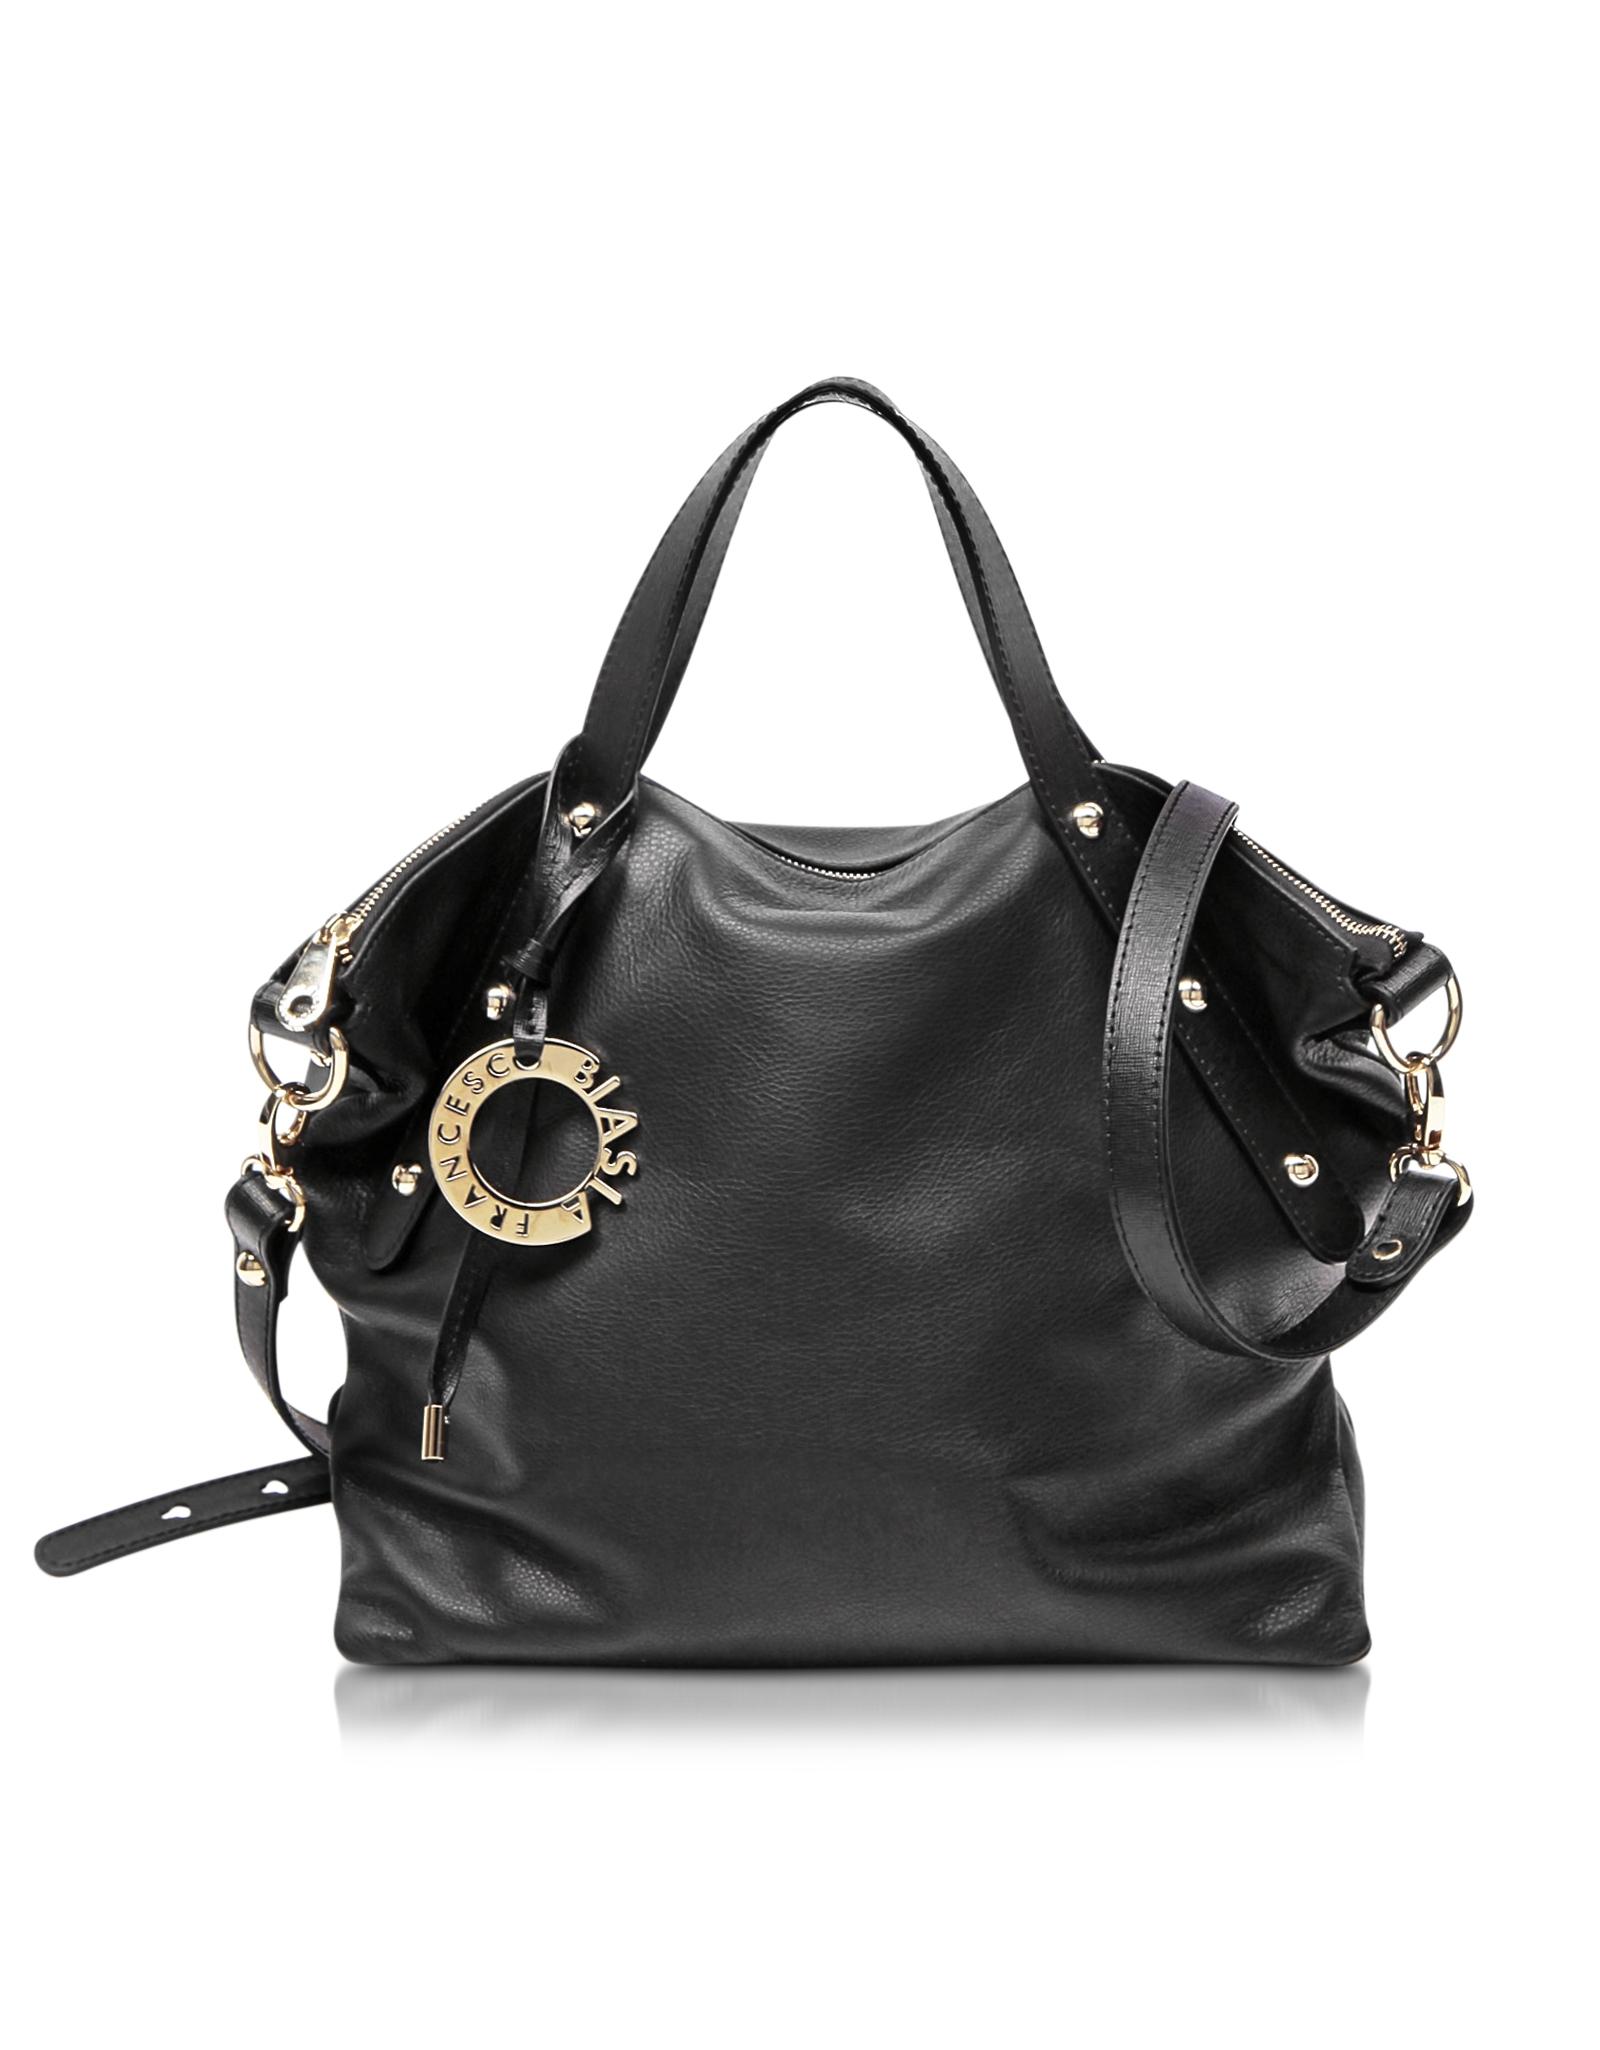 641b330fc030 Francesco Biasia Iris Black Leather Handbag W shoulder Strap in ...